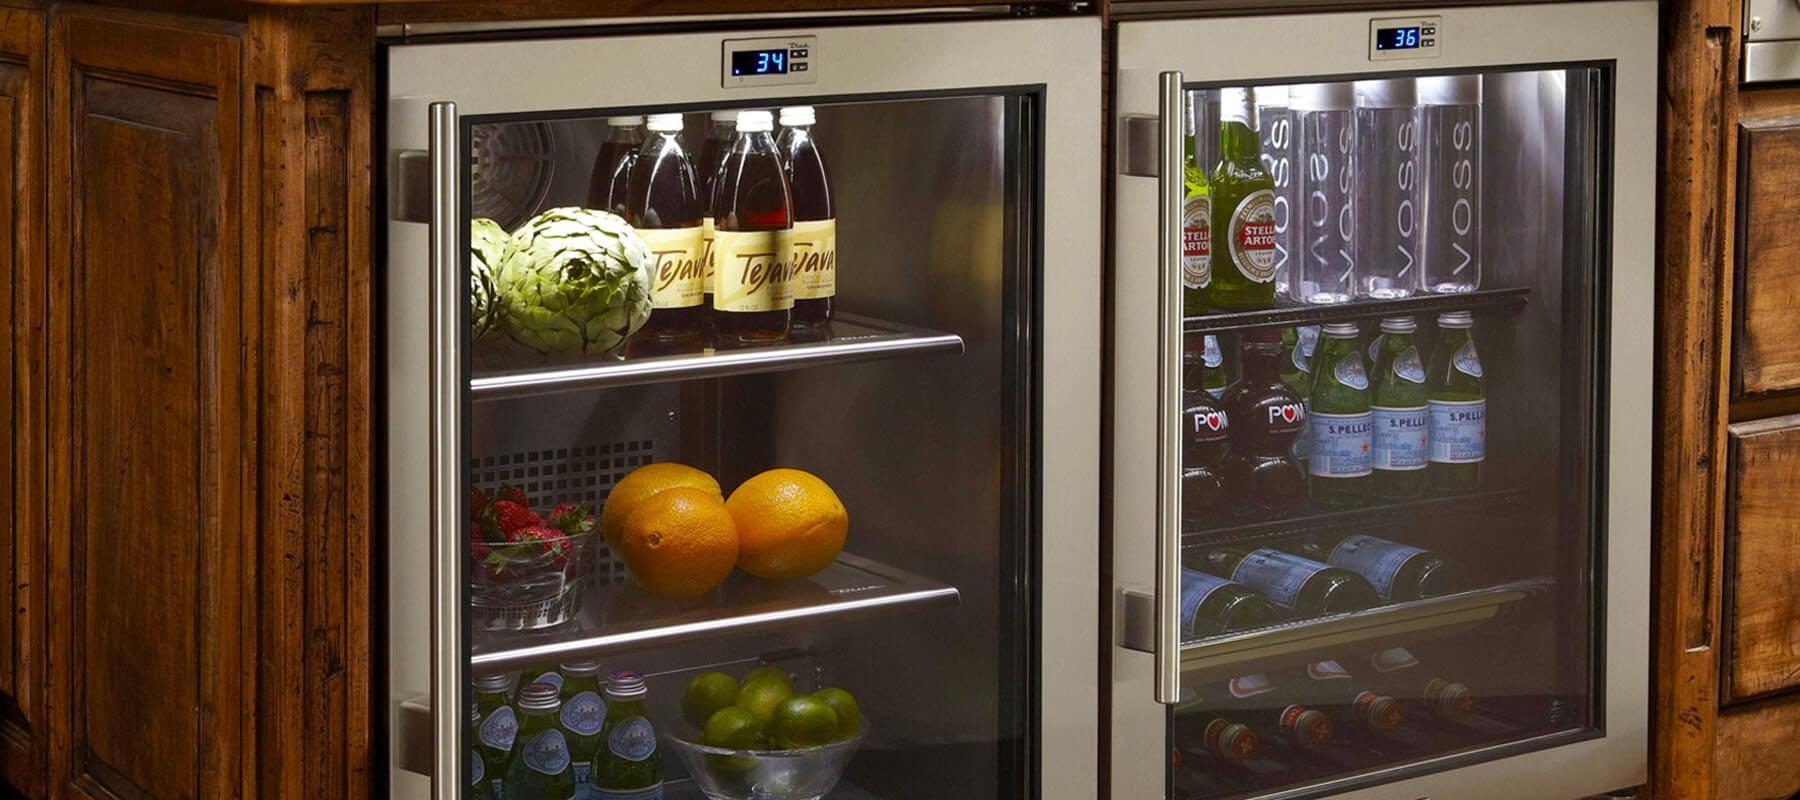 Built in Wine Refrigerator Undercounter Palos Verdes Peninsula | Built-in Refrigerator Repair